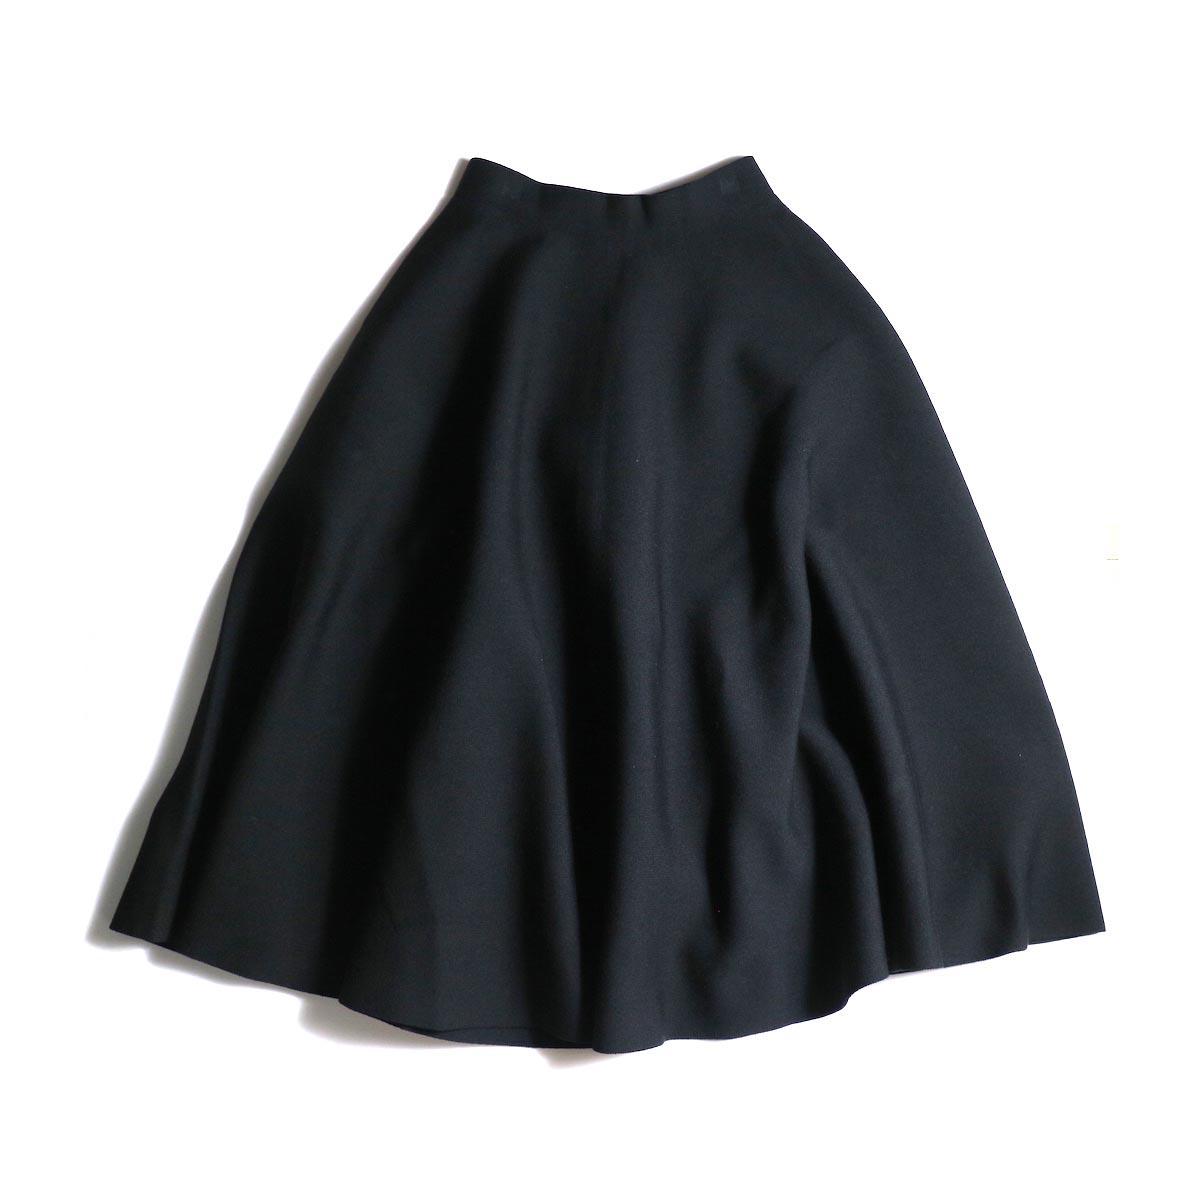 BLUEBIRD BOULEVARD / ミラノリブニットスカート (Black)